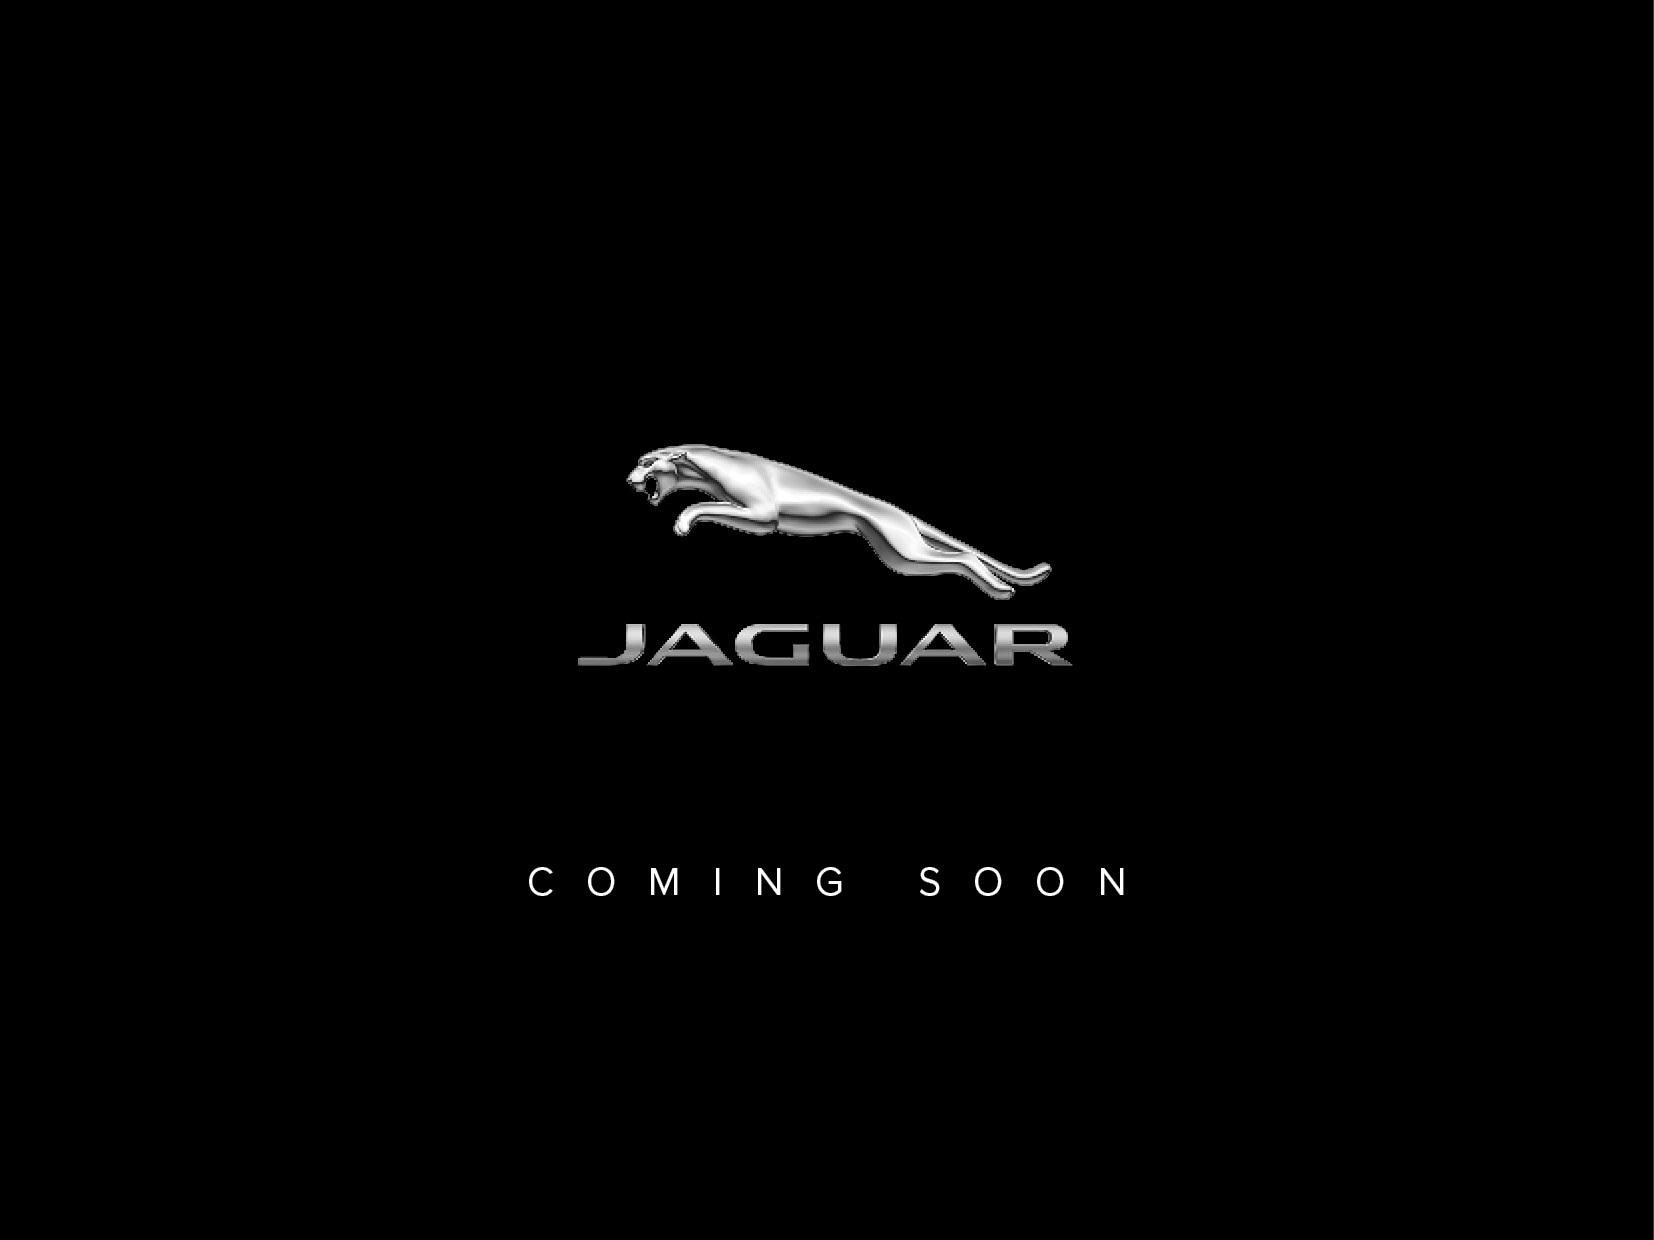 Jaguar XF 2.2d [163] Luxury Diesel Automatic 4 door Saloon (2015) image